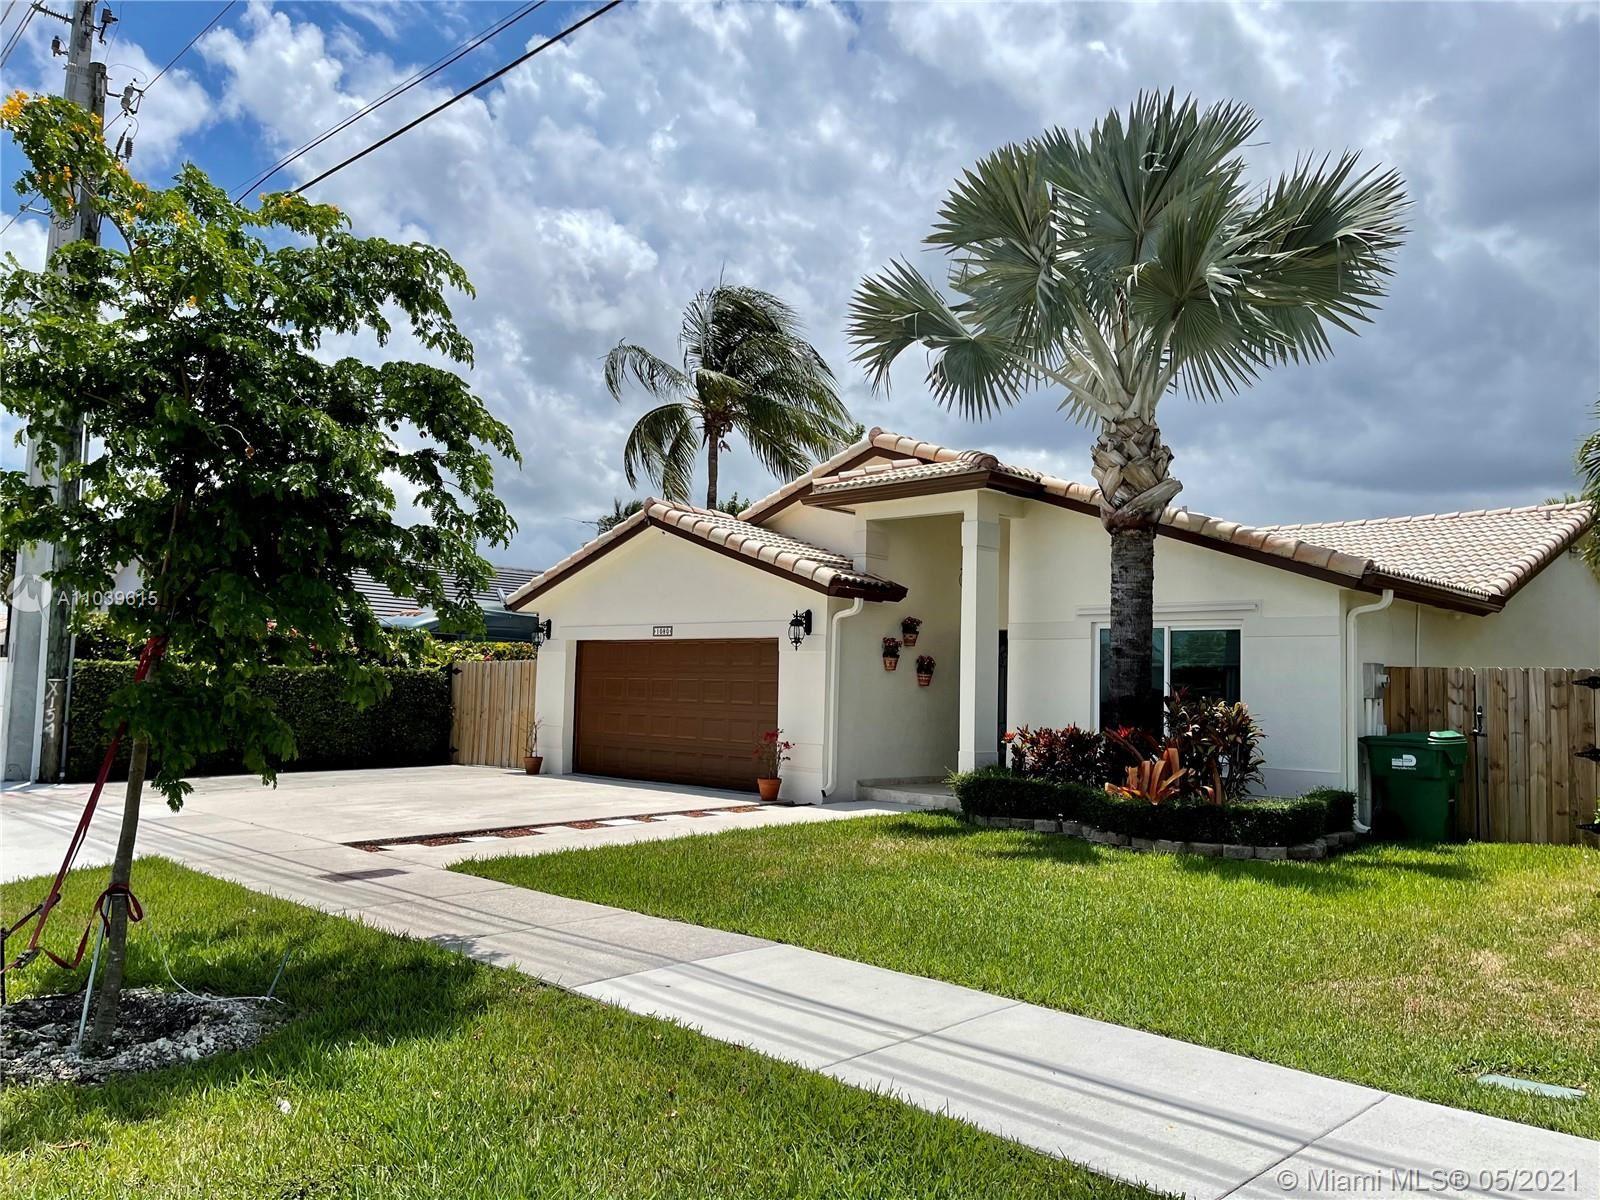 1080 SW 142nd Ave, Miami, FL 33184 - #: A11039615